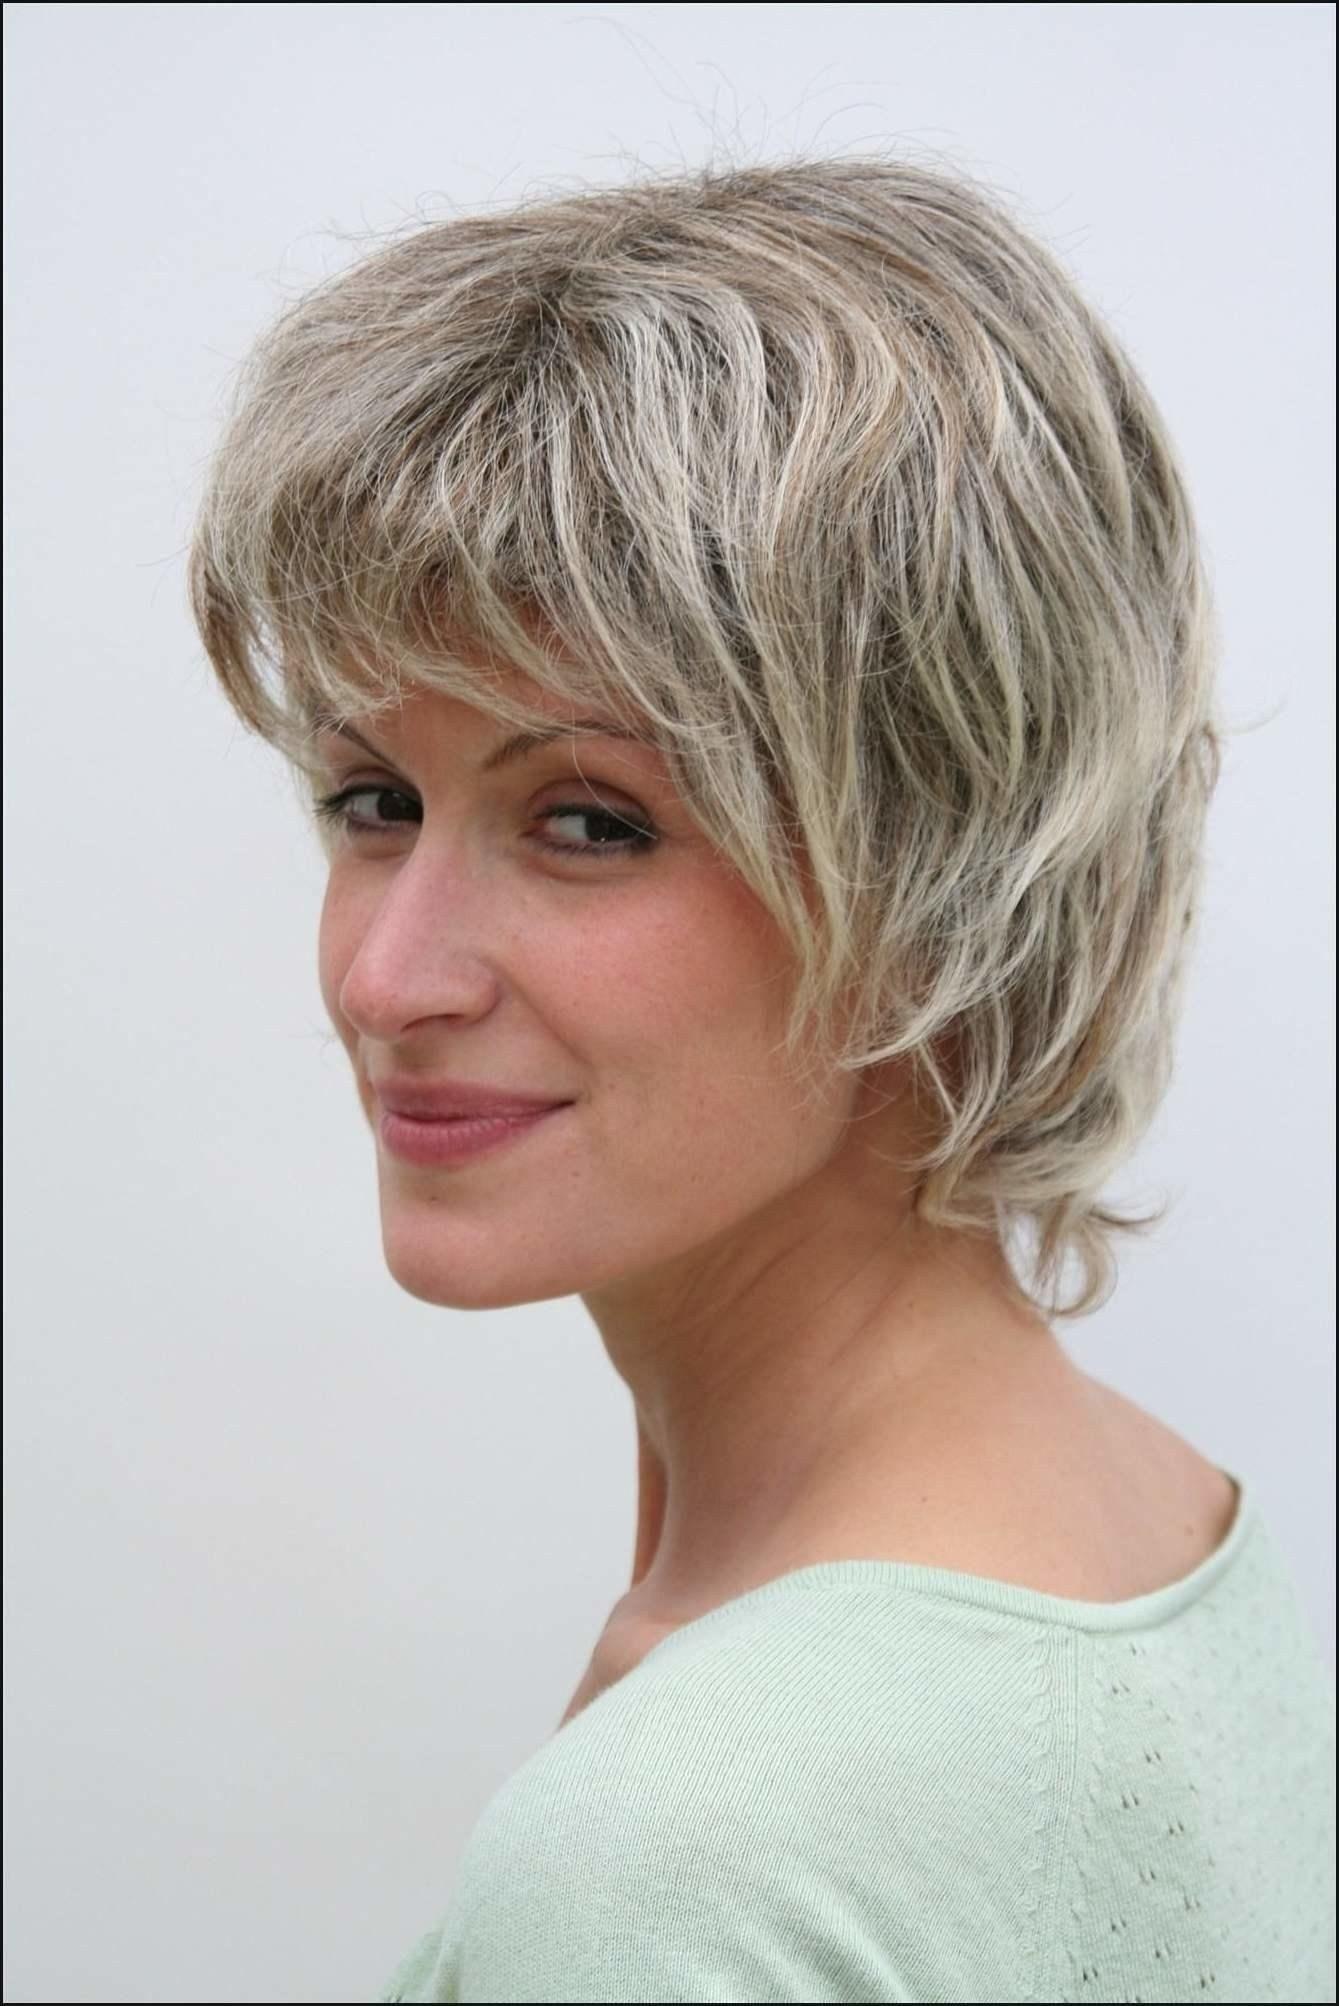 Frisuren Fur Frauen Ab 60 Kurze Haare Modell Kurzhaarfrisuren Frisur Ab 40